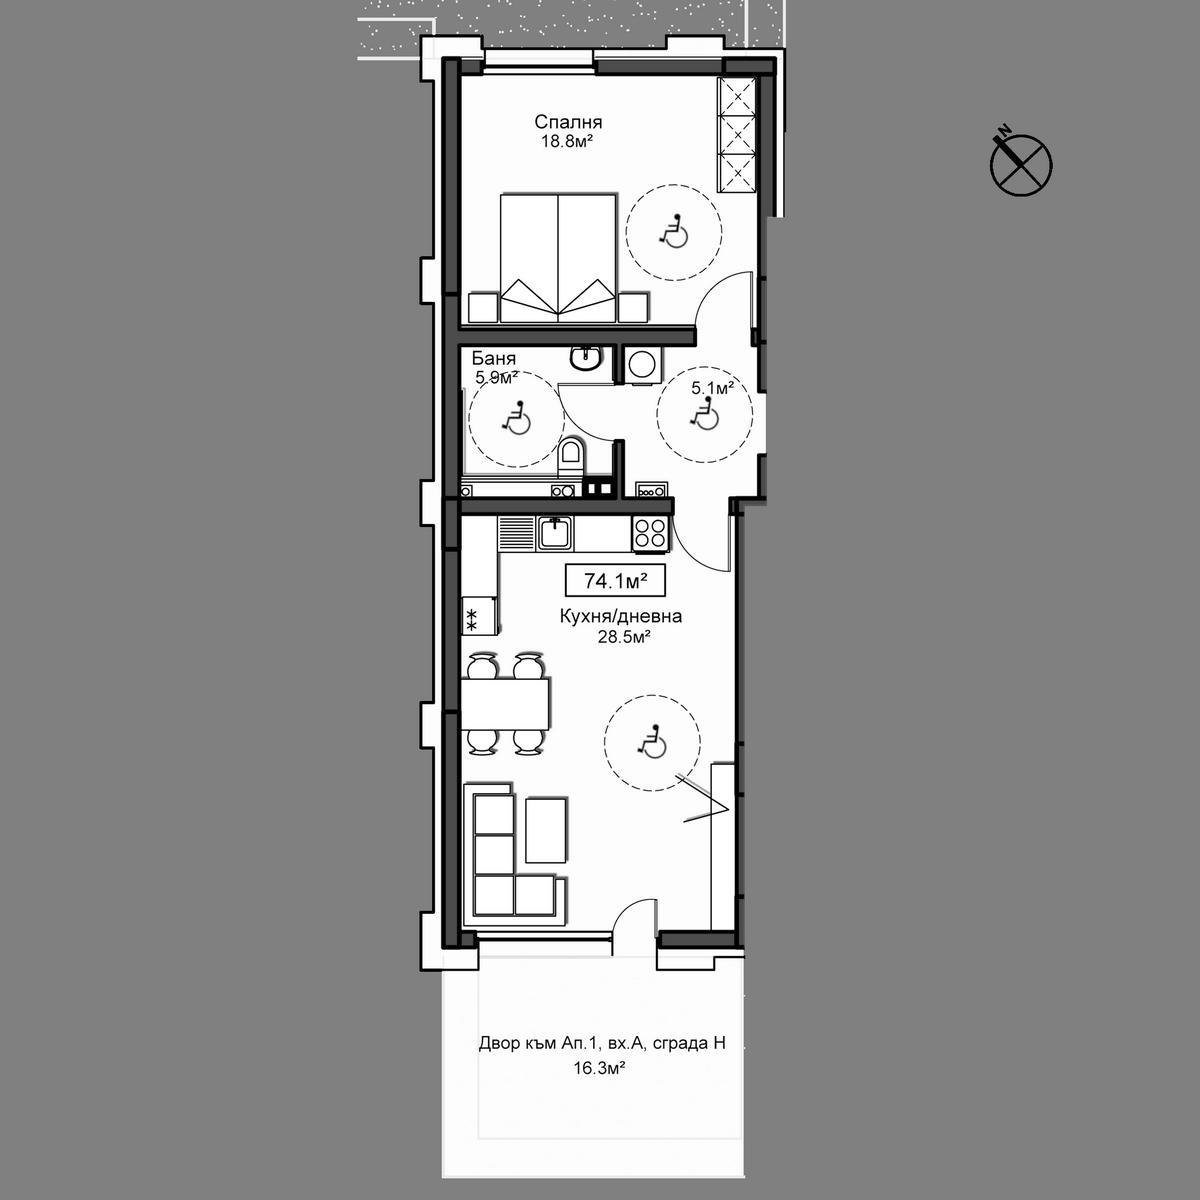 Апартамент А1